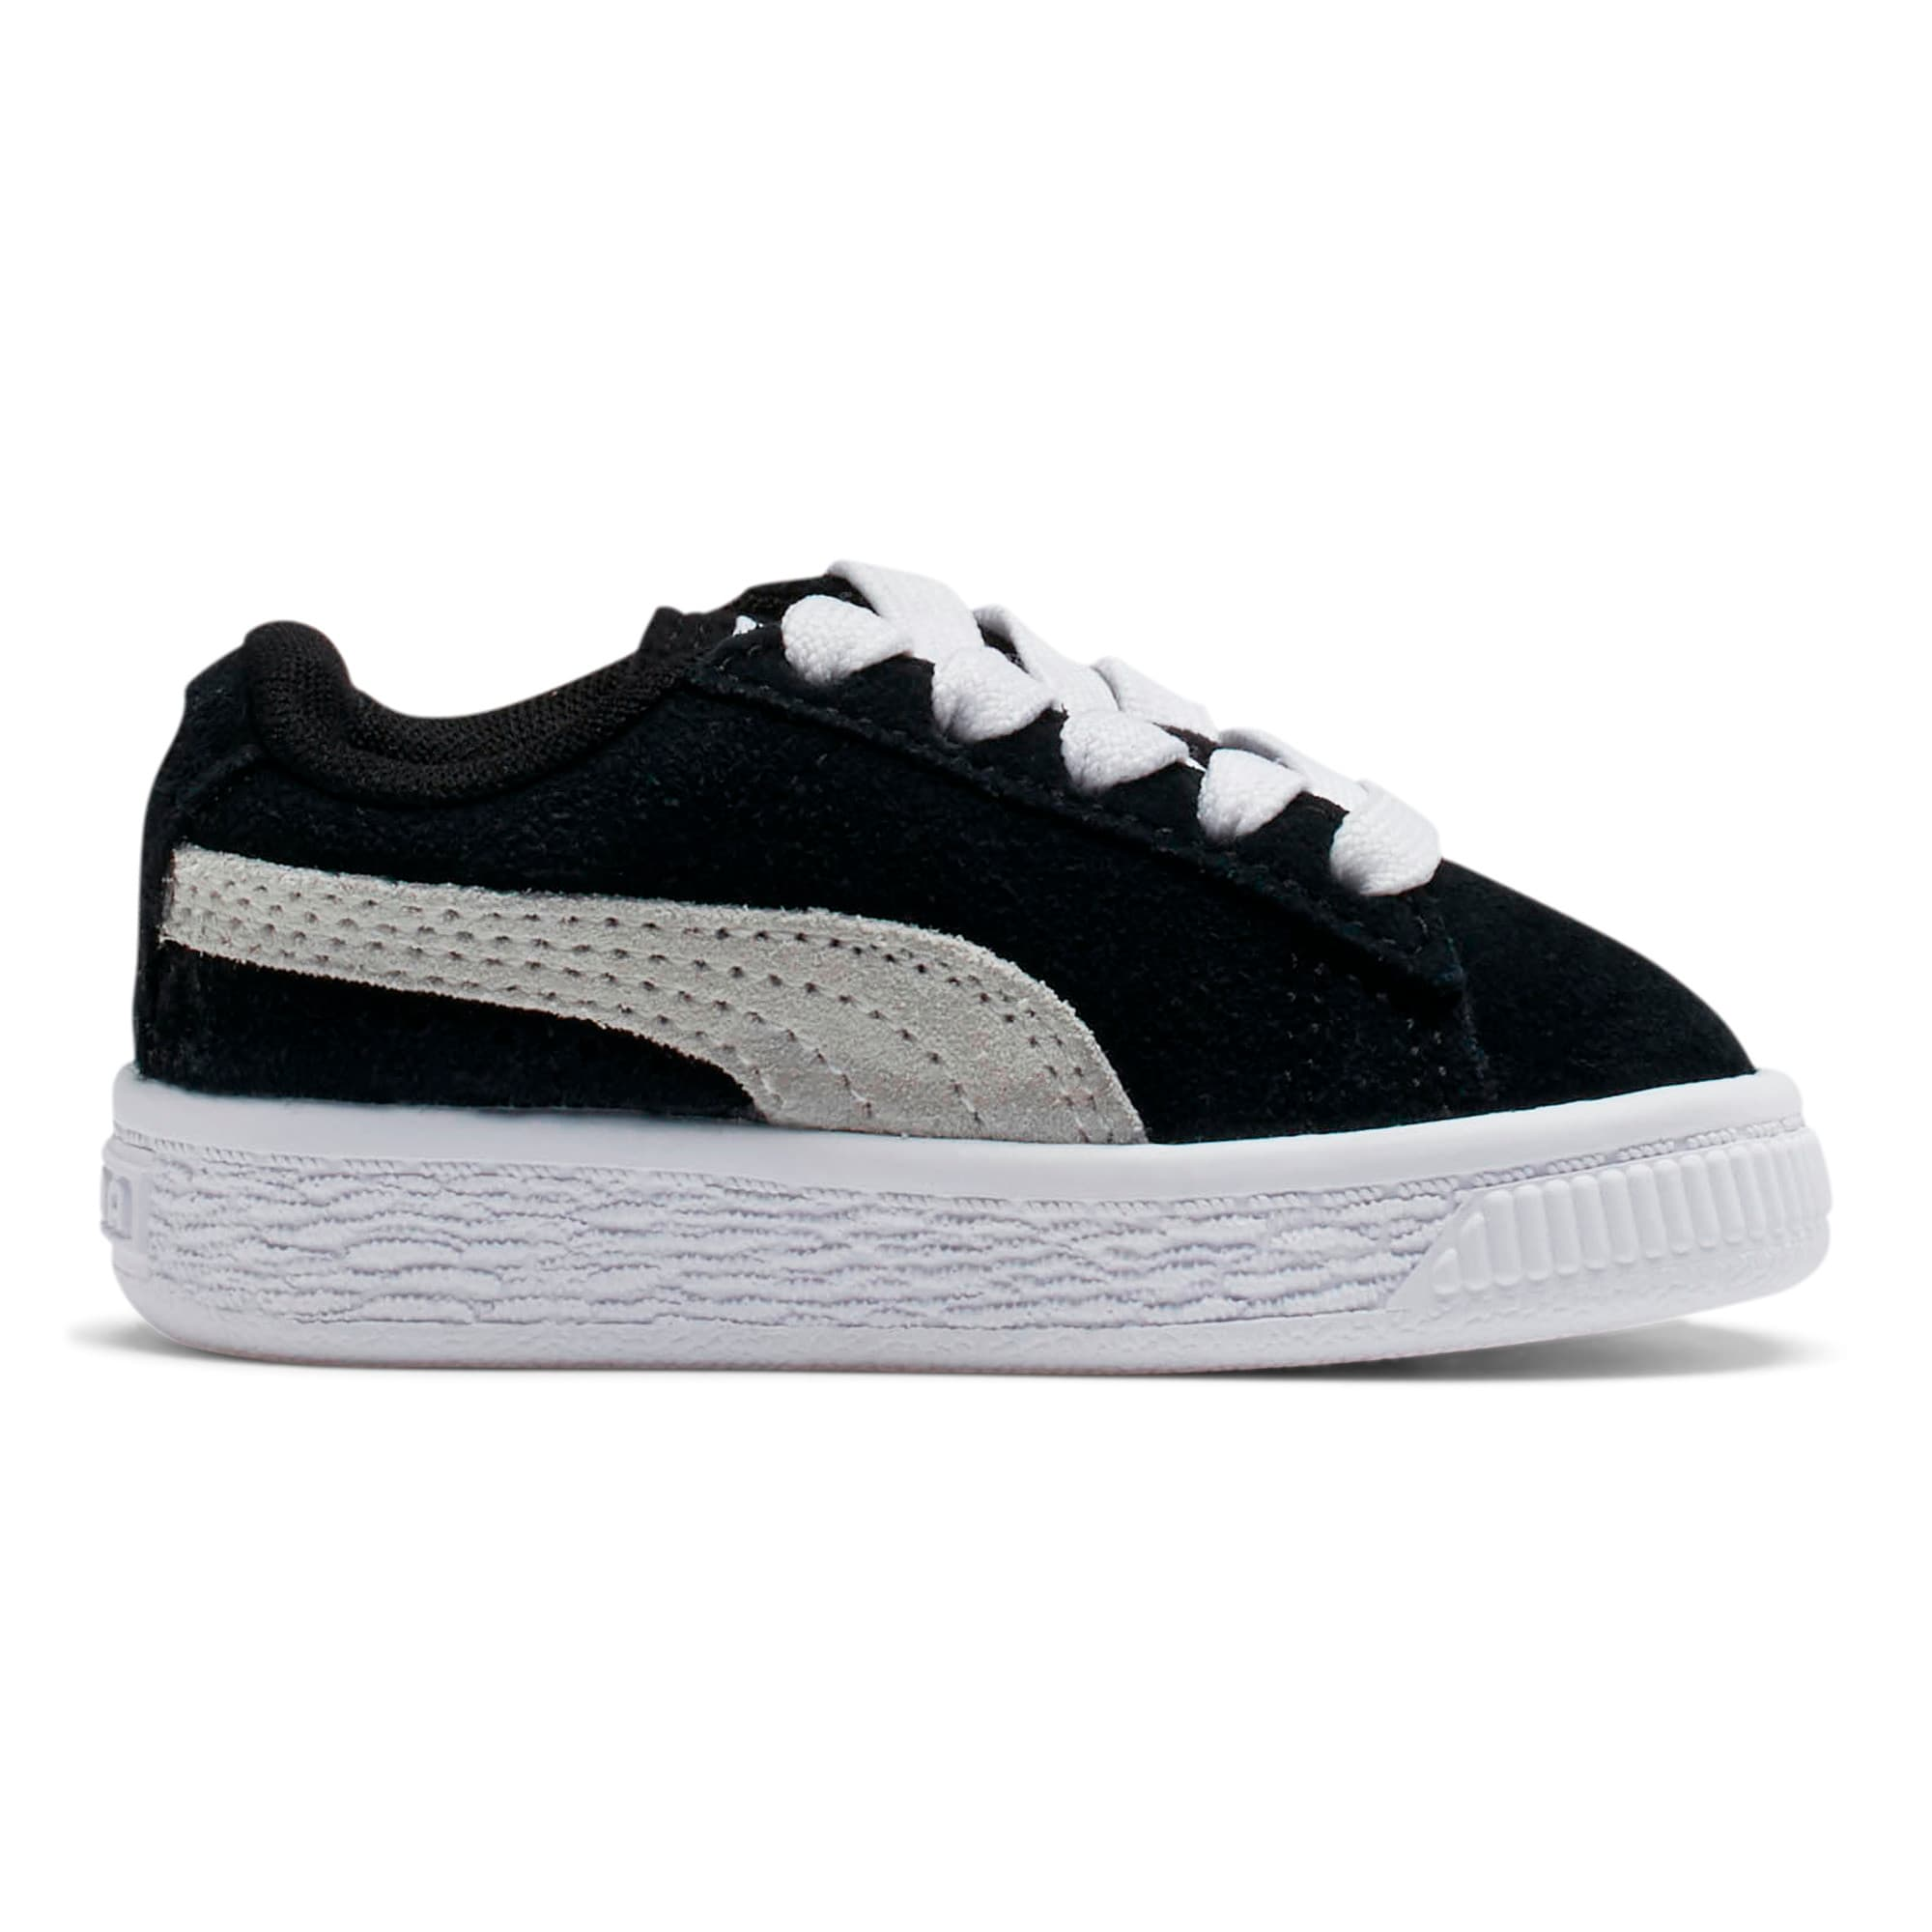 Thumbnail 5 of Puma Suede Toddler Shoes, black-white, medium